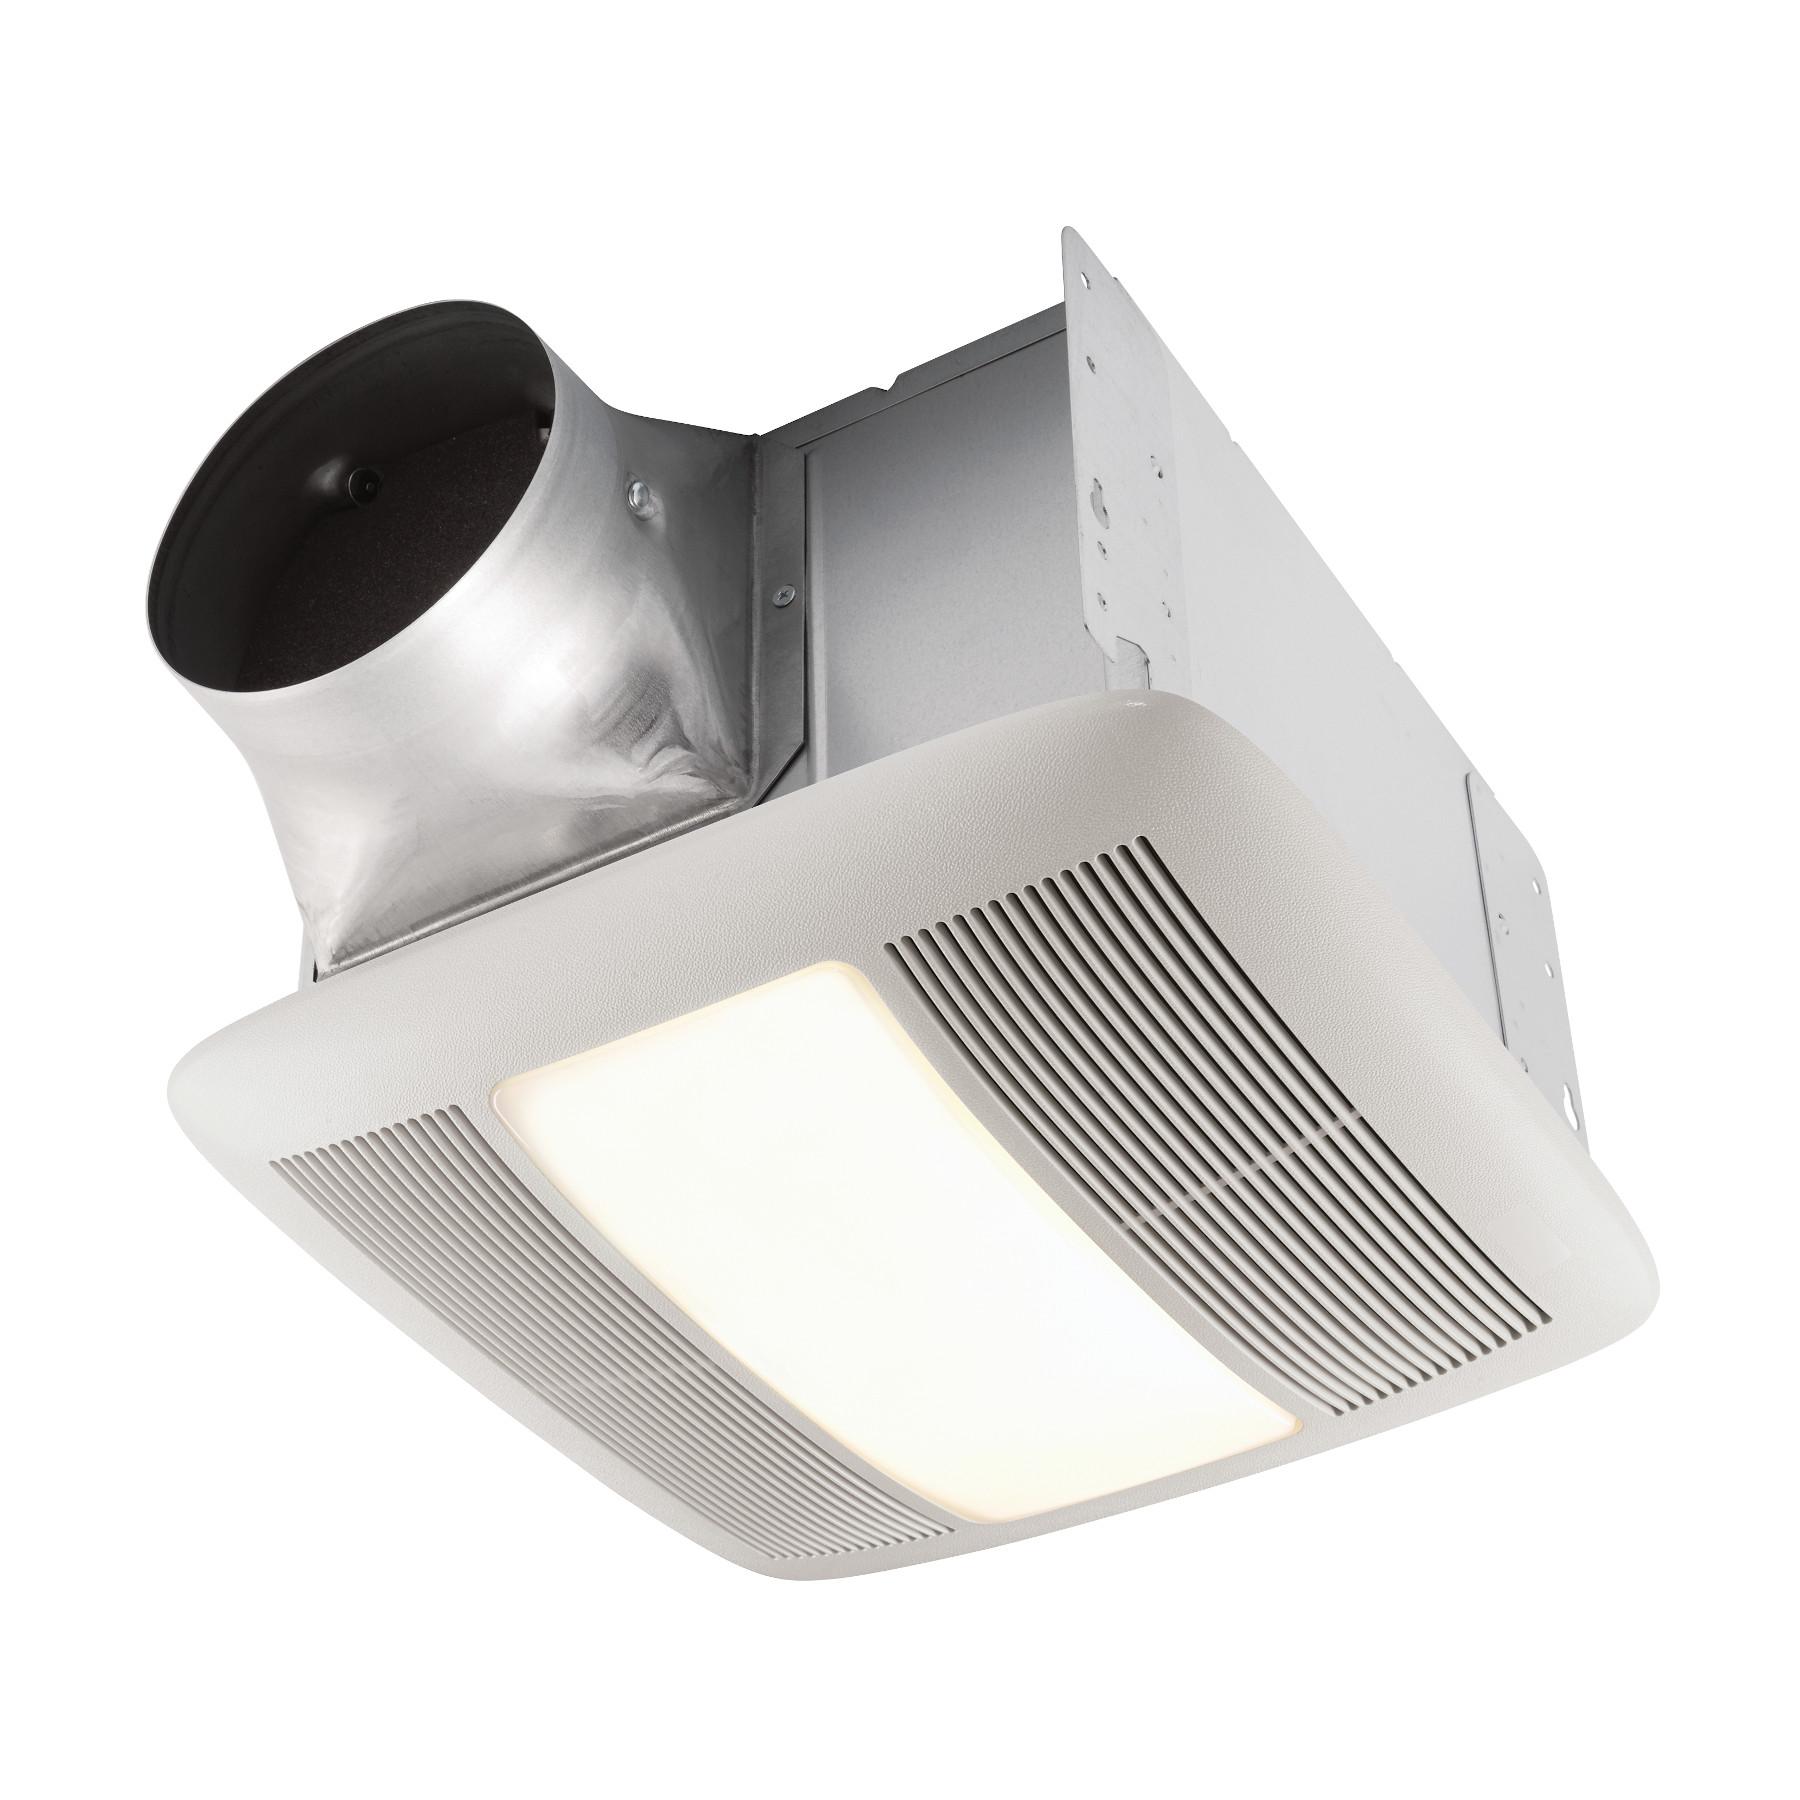 QT140LE Broan® 140 CFM Ventilation Fan Light with Night LightQuiet Bathroom  Fan/Light/Night Light, ENERGY STBroan-NuTone